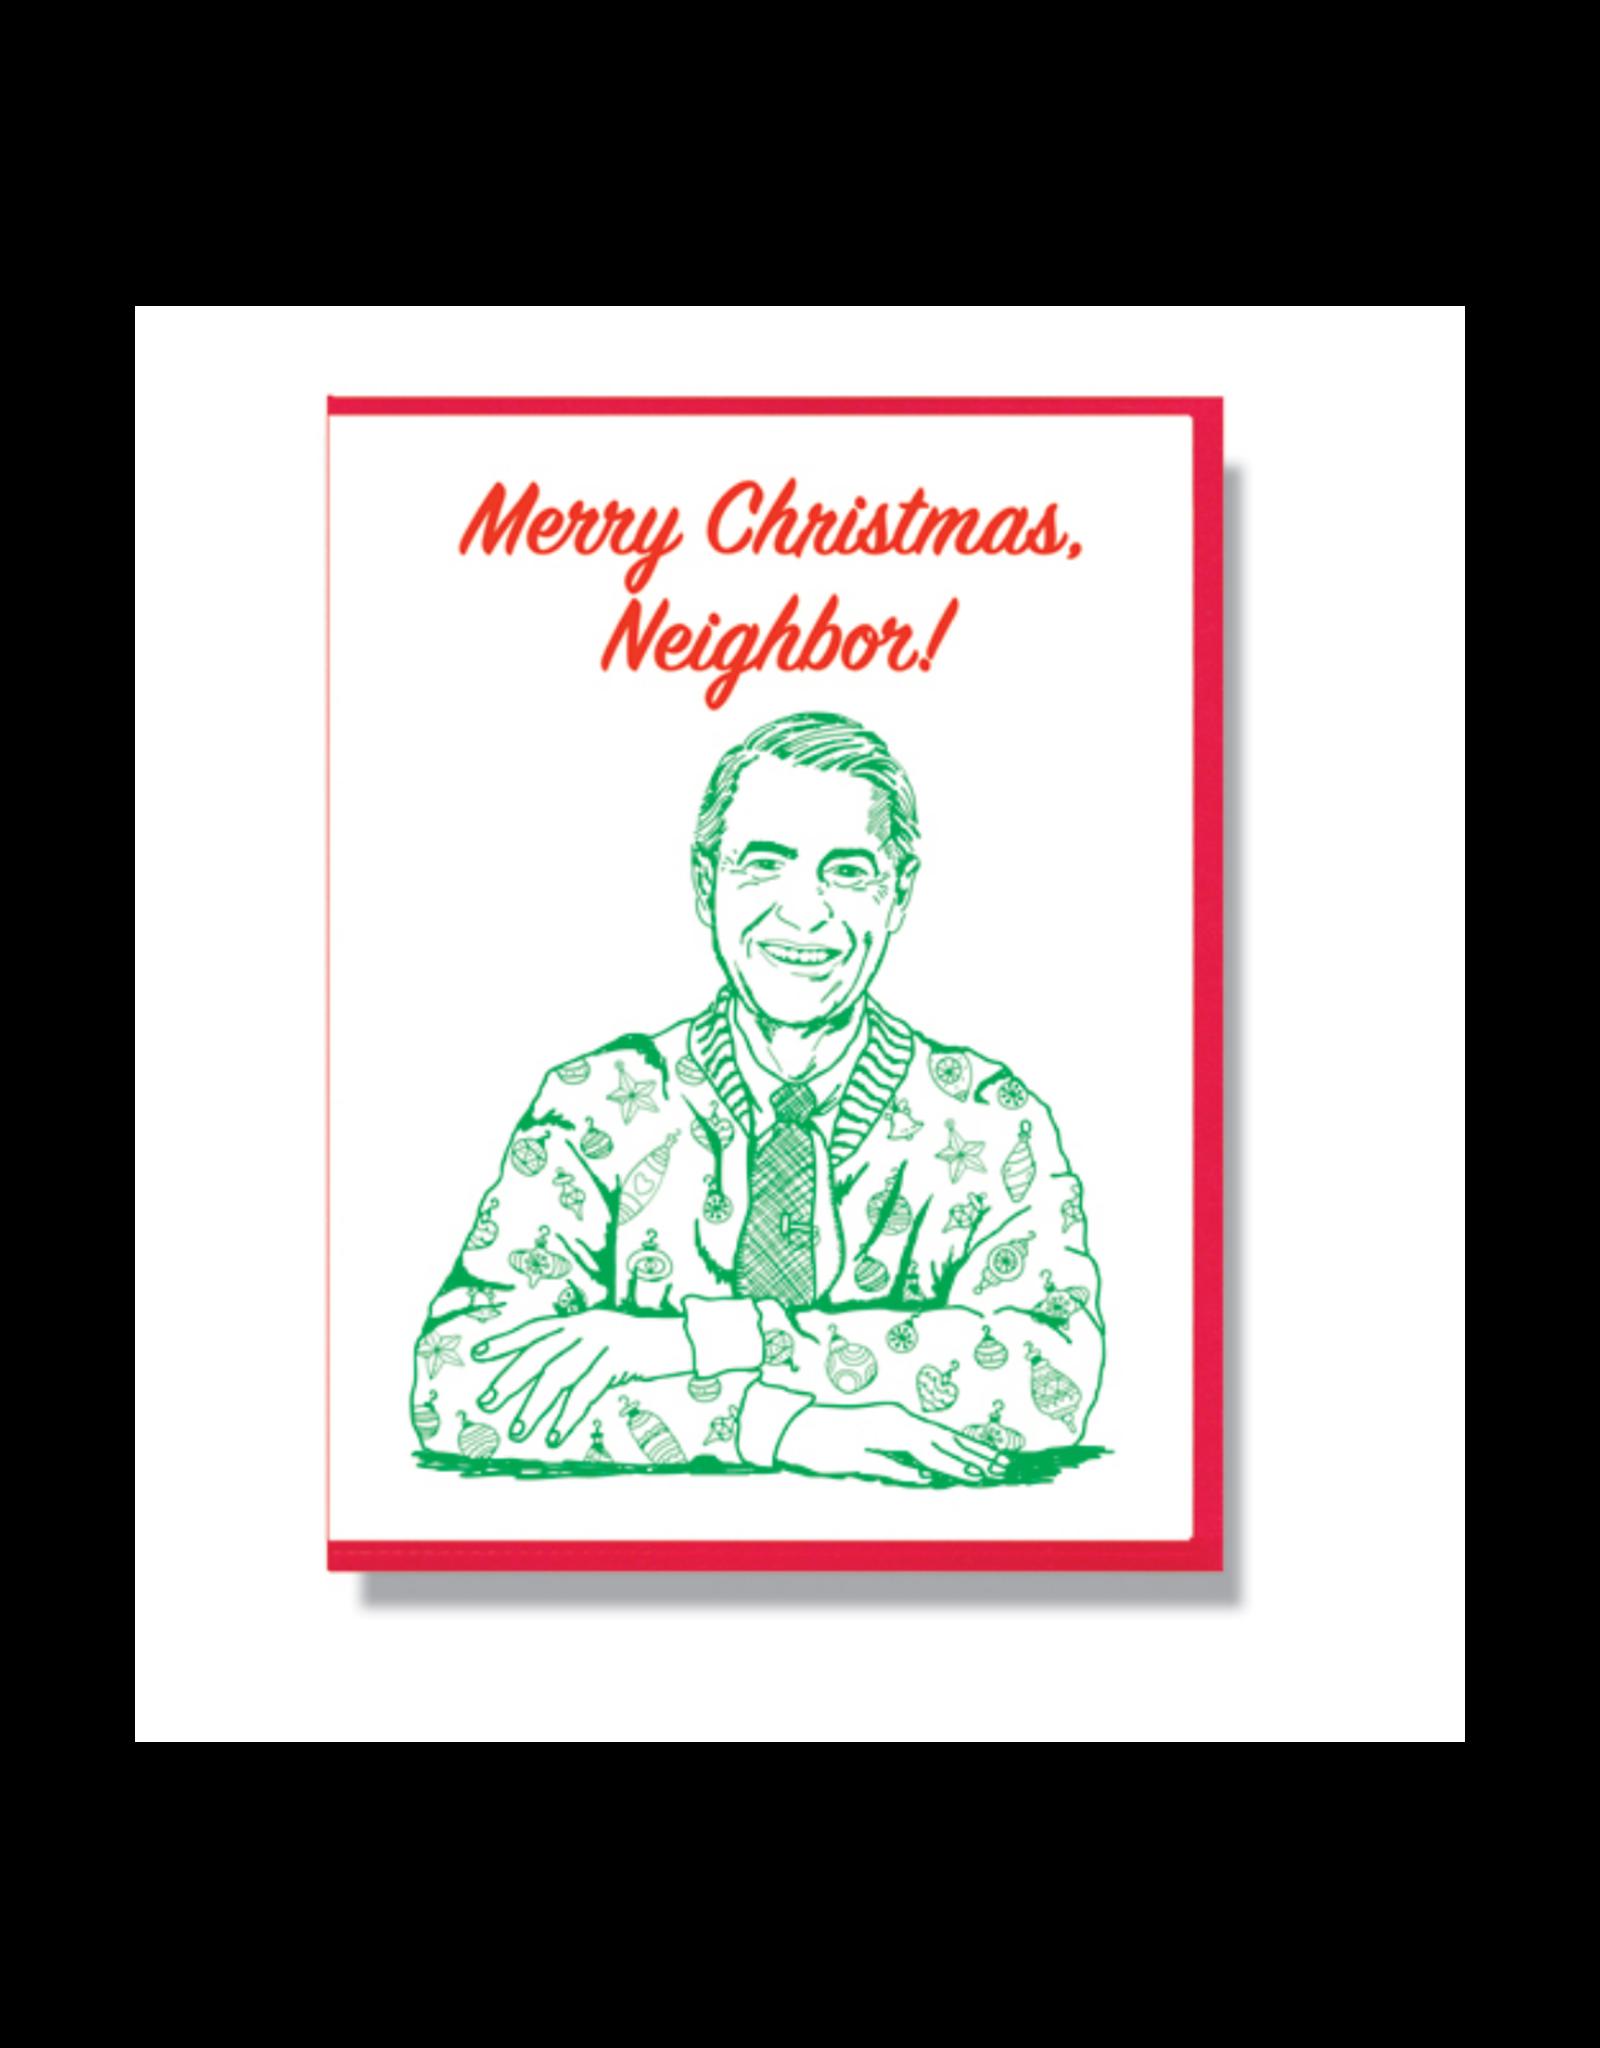 Merry Christmas, Neighbor! Mr. Rogers Holiday Card